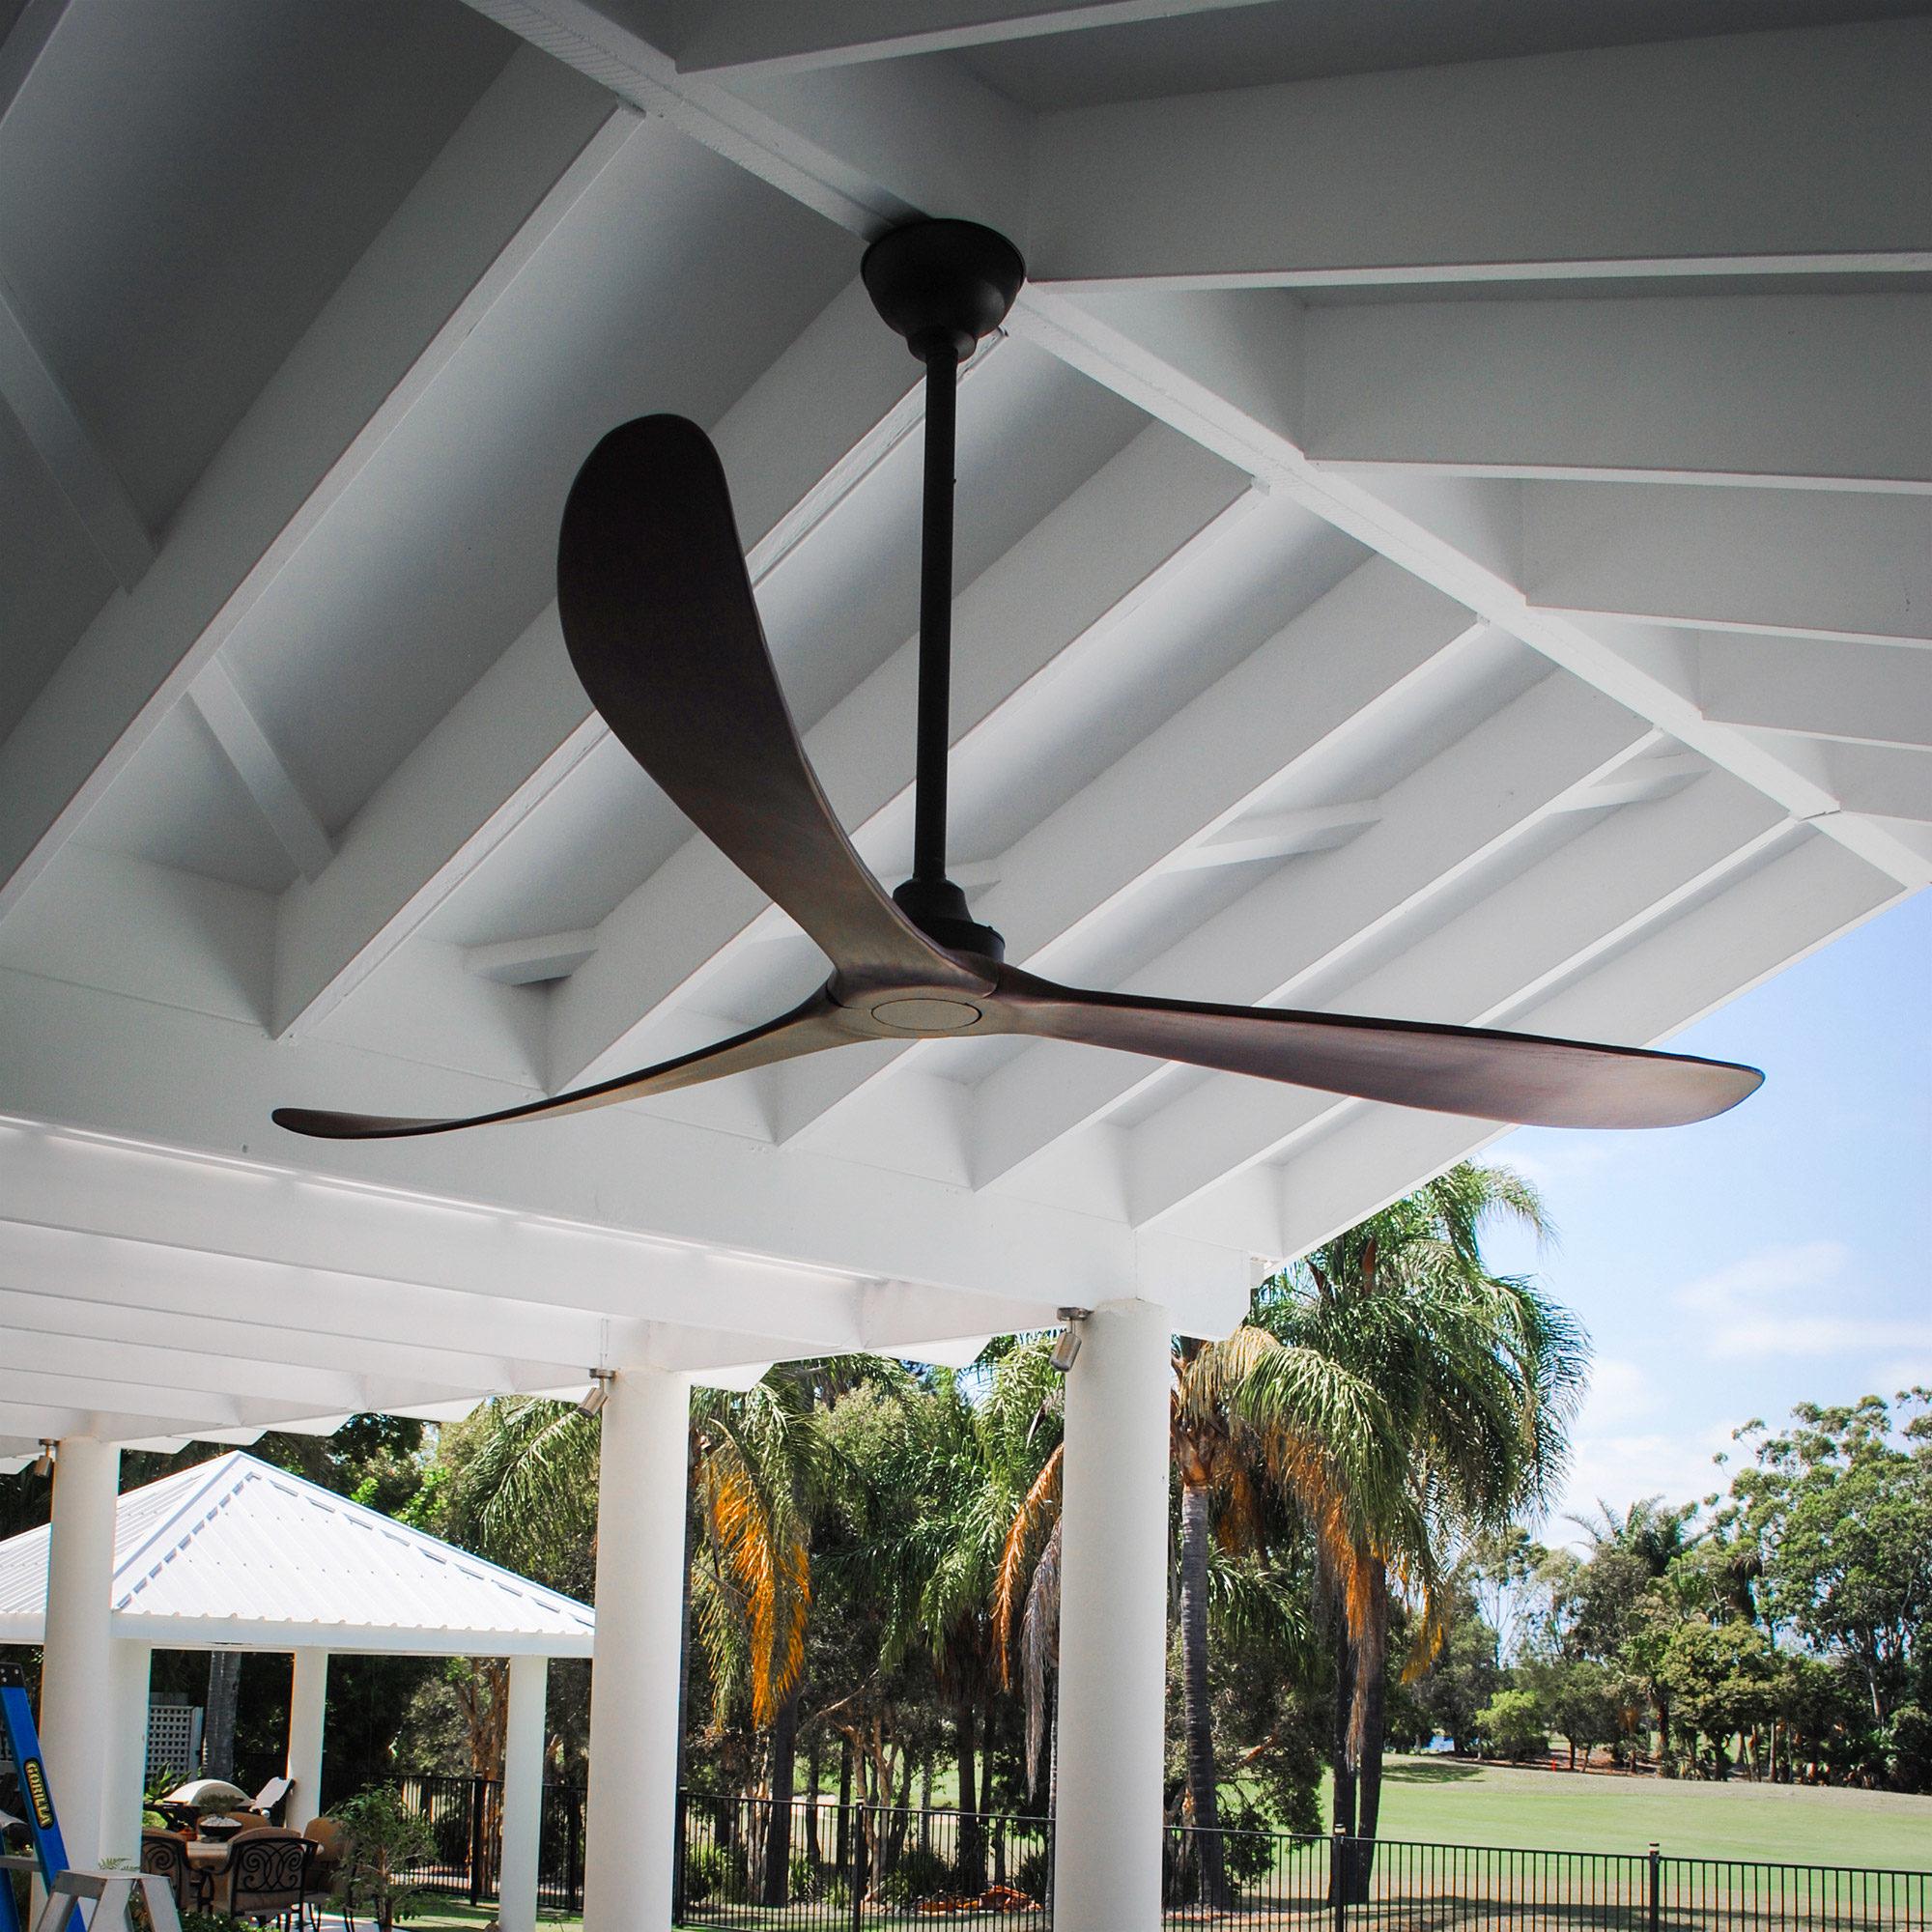 Kirra KIR100 DC Ceiling Fan 4 Square